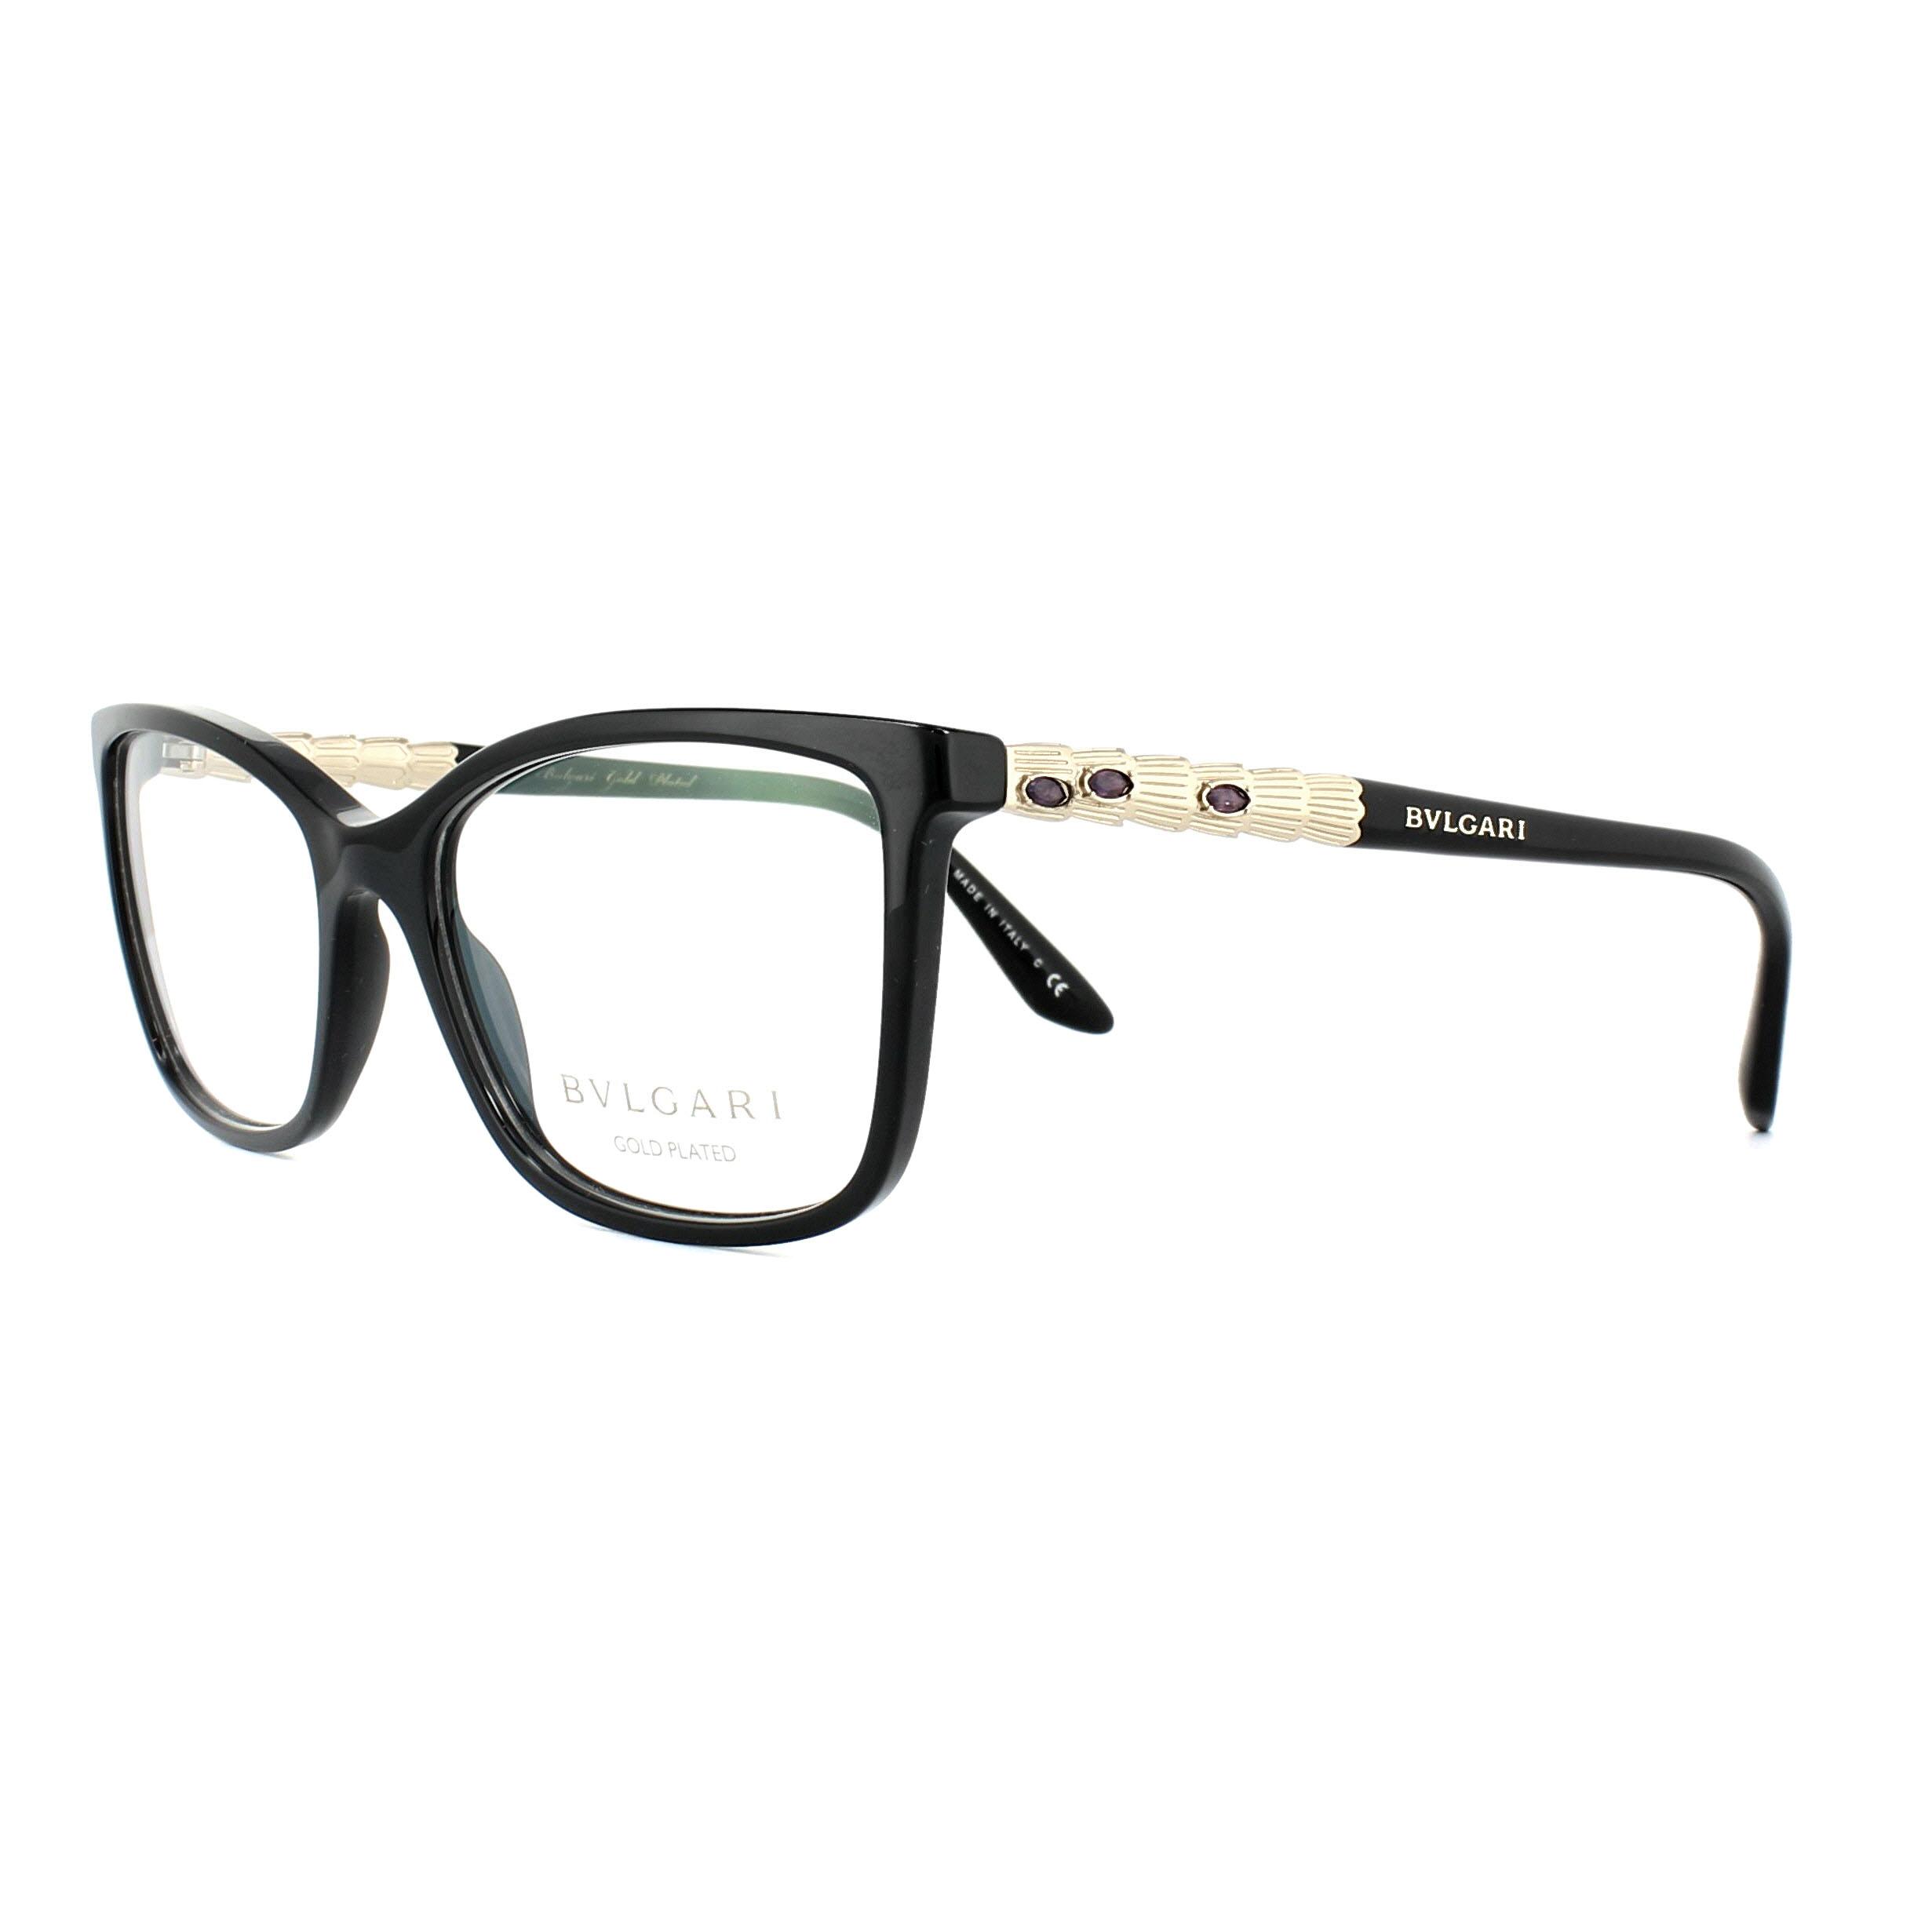 7287b2bdd8 Cheap Bvlgari 4130KB Glasses Frames - Discounted Sunglasses